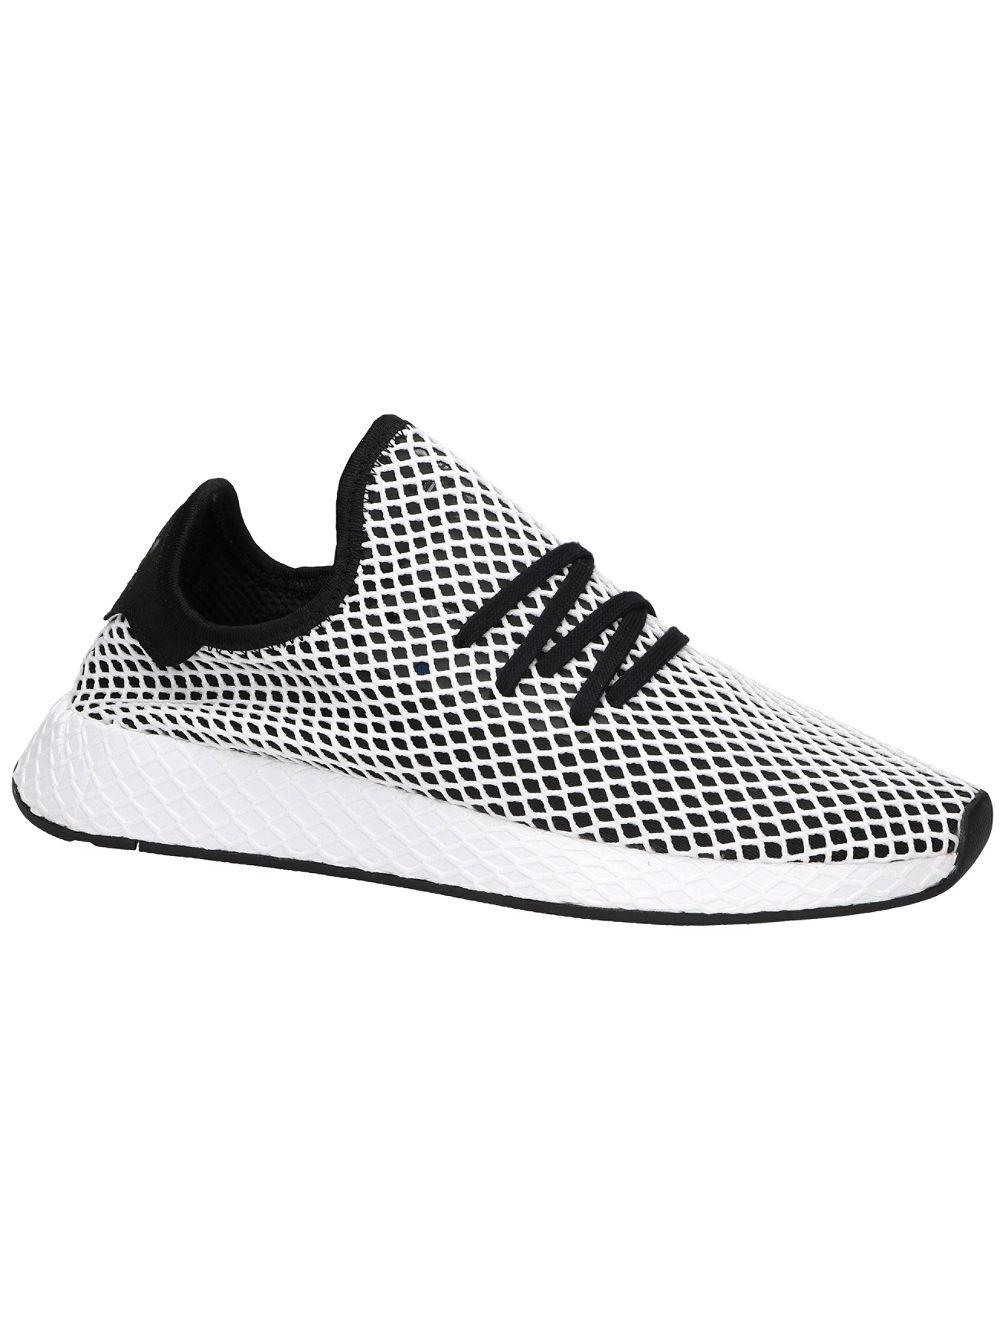 wholesale dealer 3ba34 63492 Compra adidas Originals Deerupt Sneakers en línea en blue-tomato.com